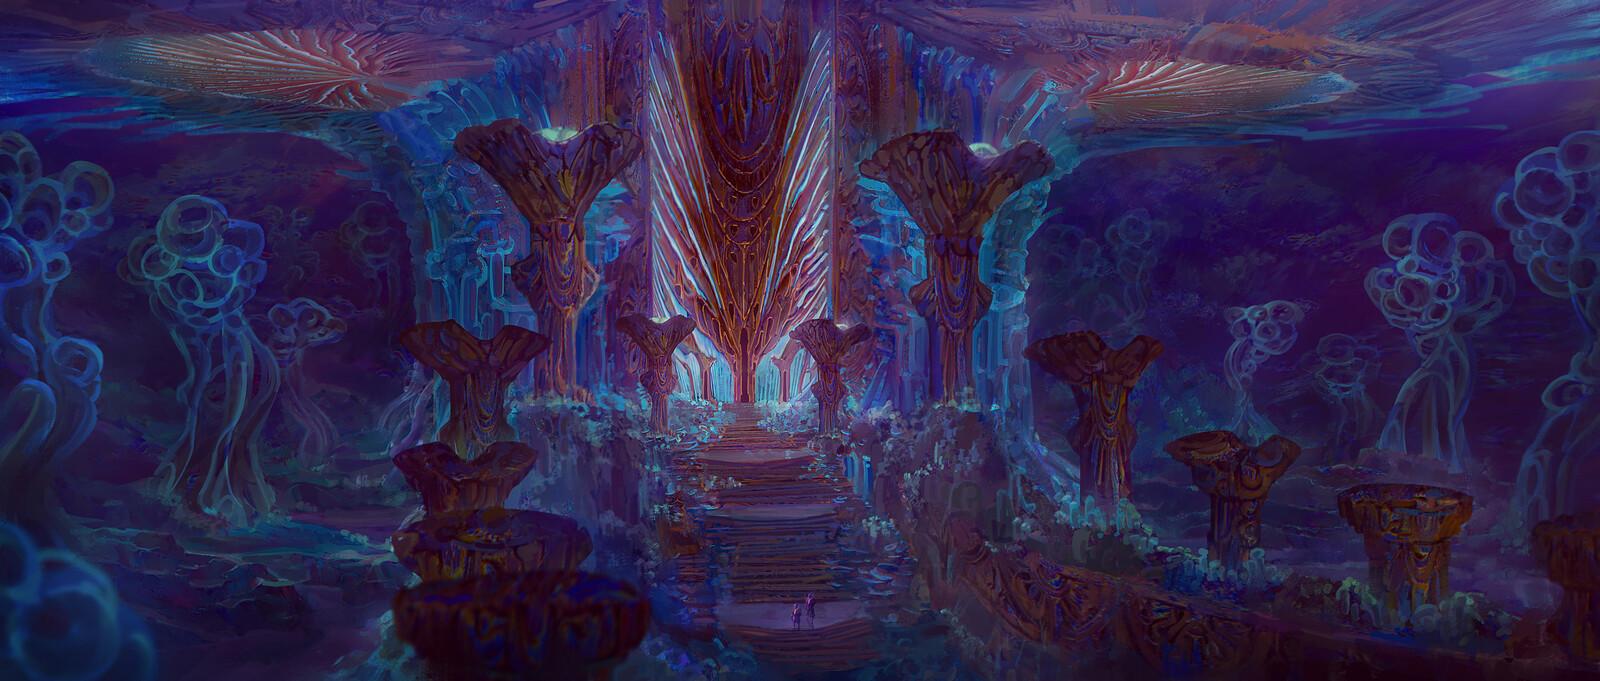 Aquatic Fungal World-Alien Temple